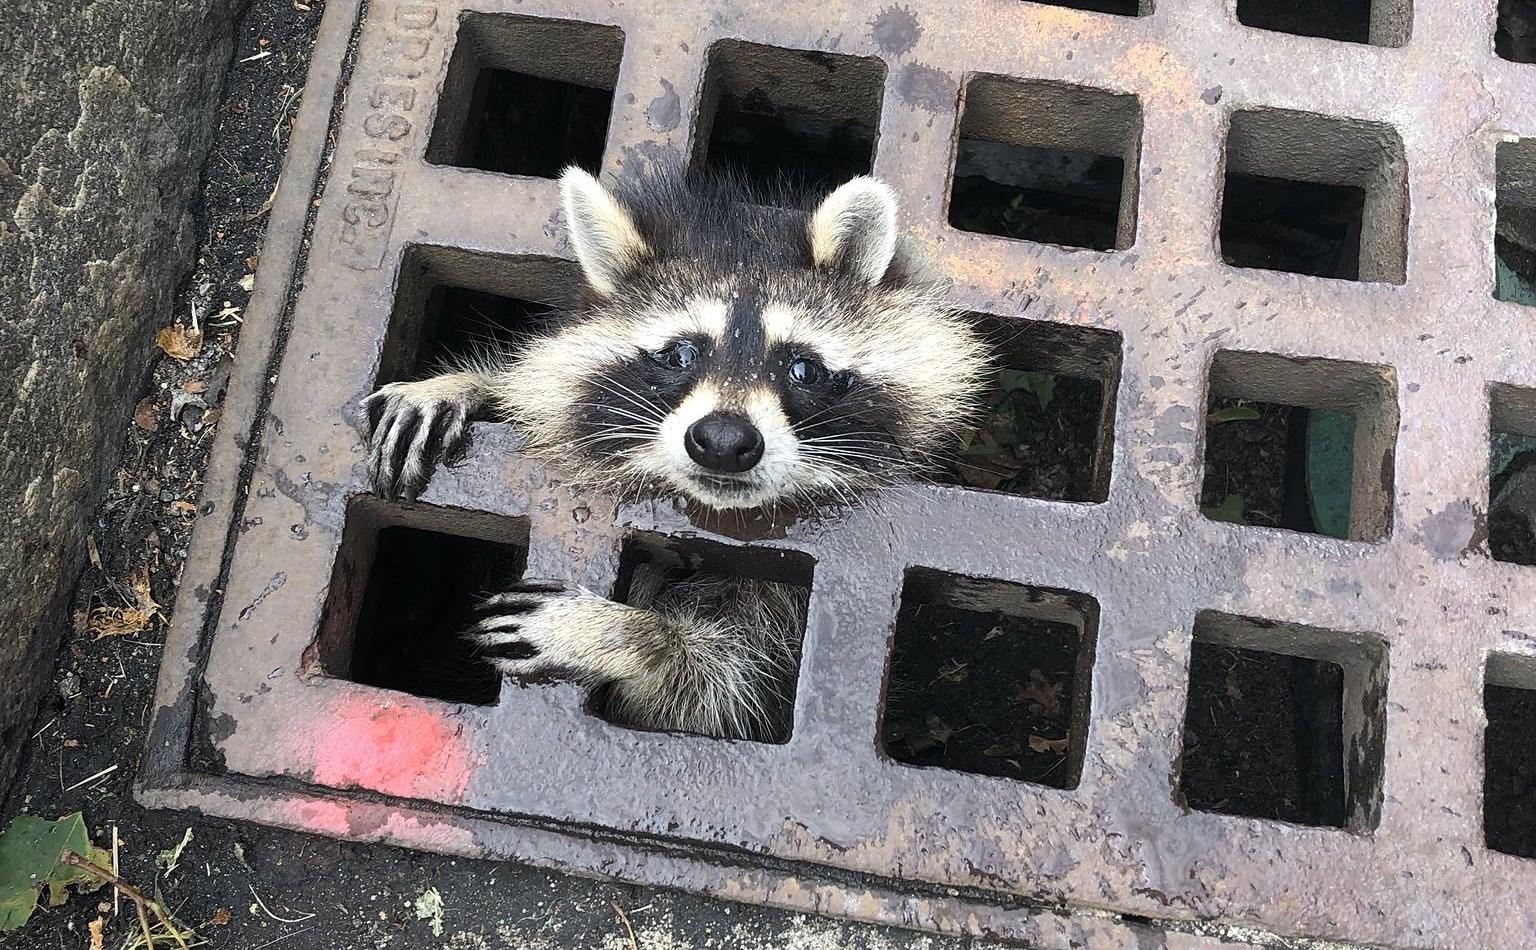 190802 grate raccoon ew 1048a 417523a70be244c42ec58dafa72ec089.fit 2000w